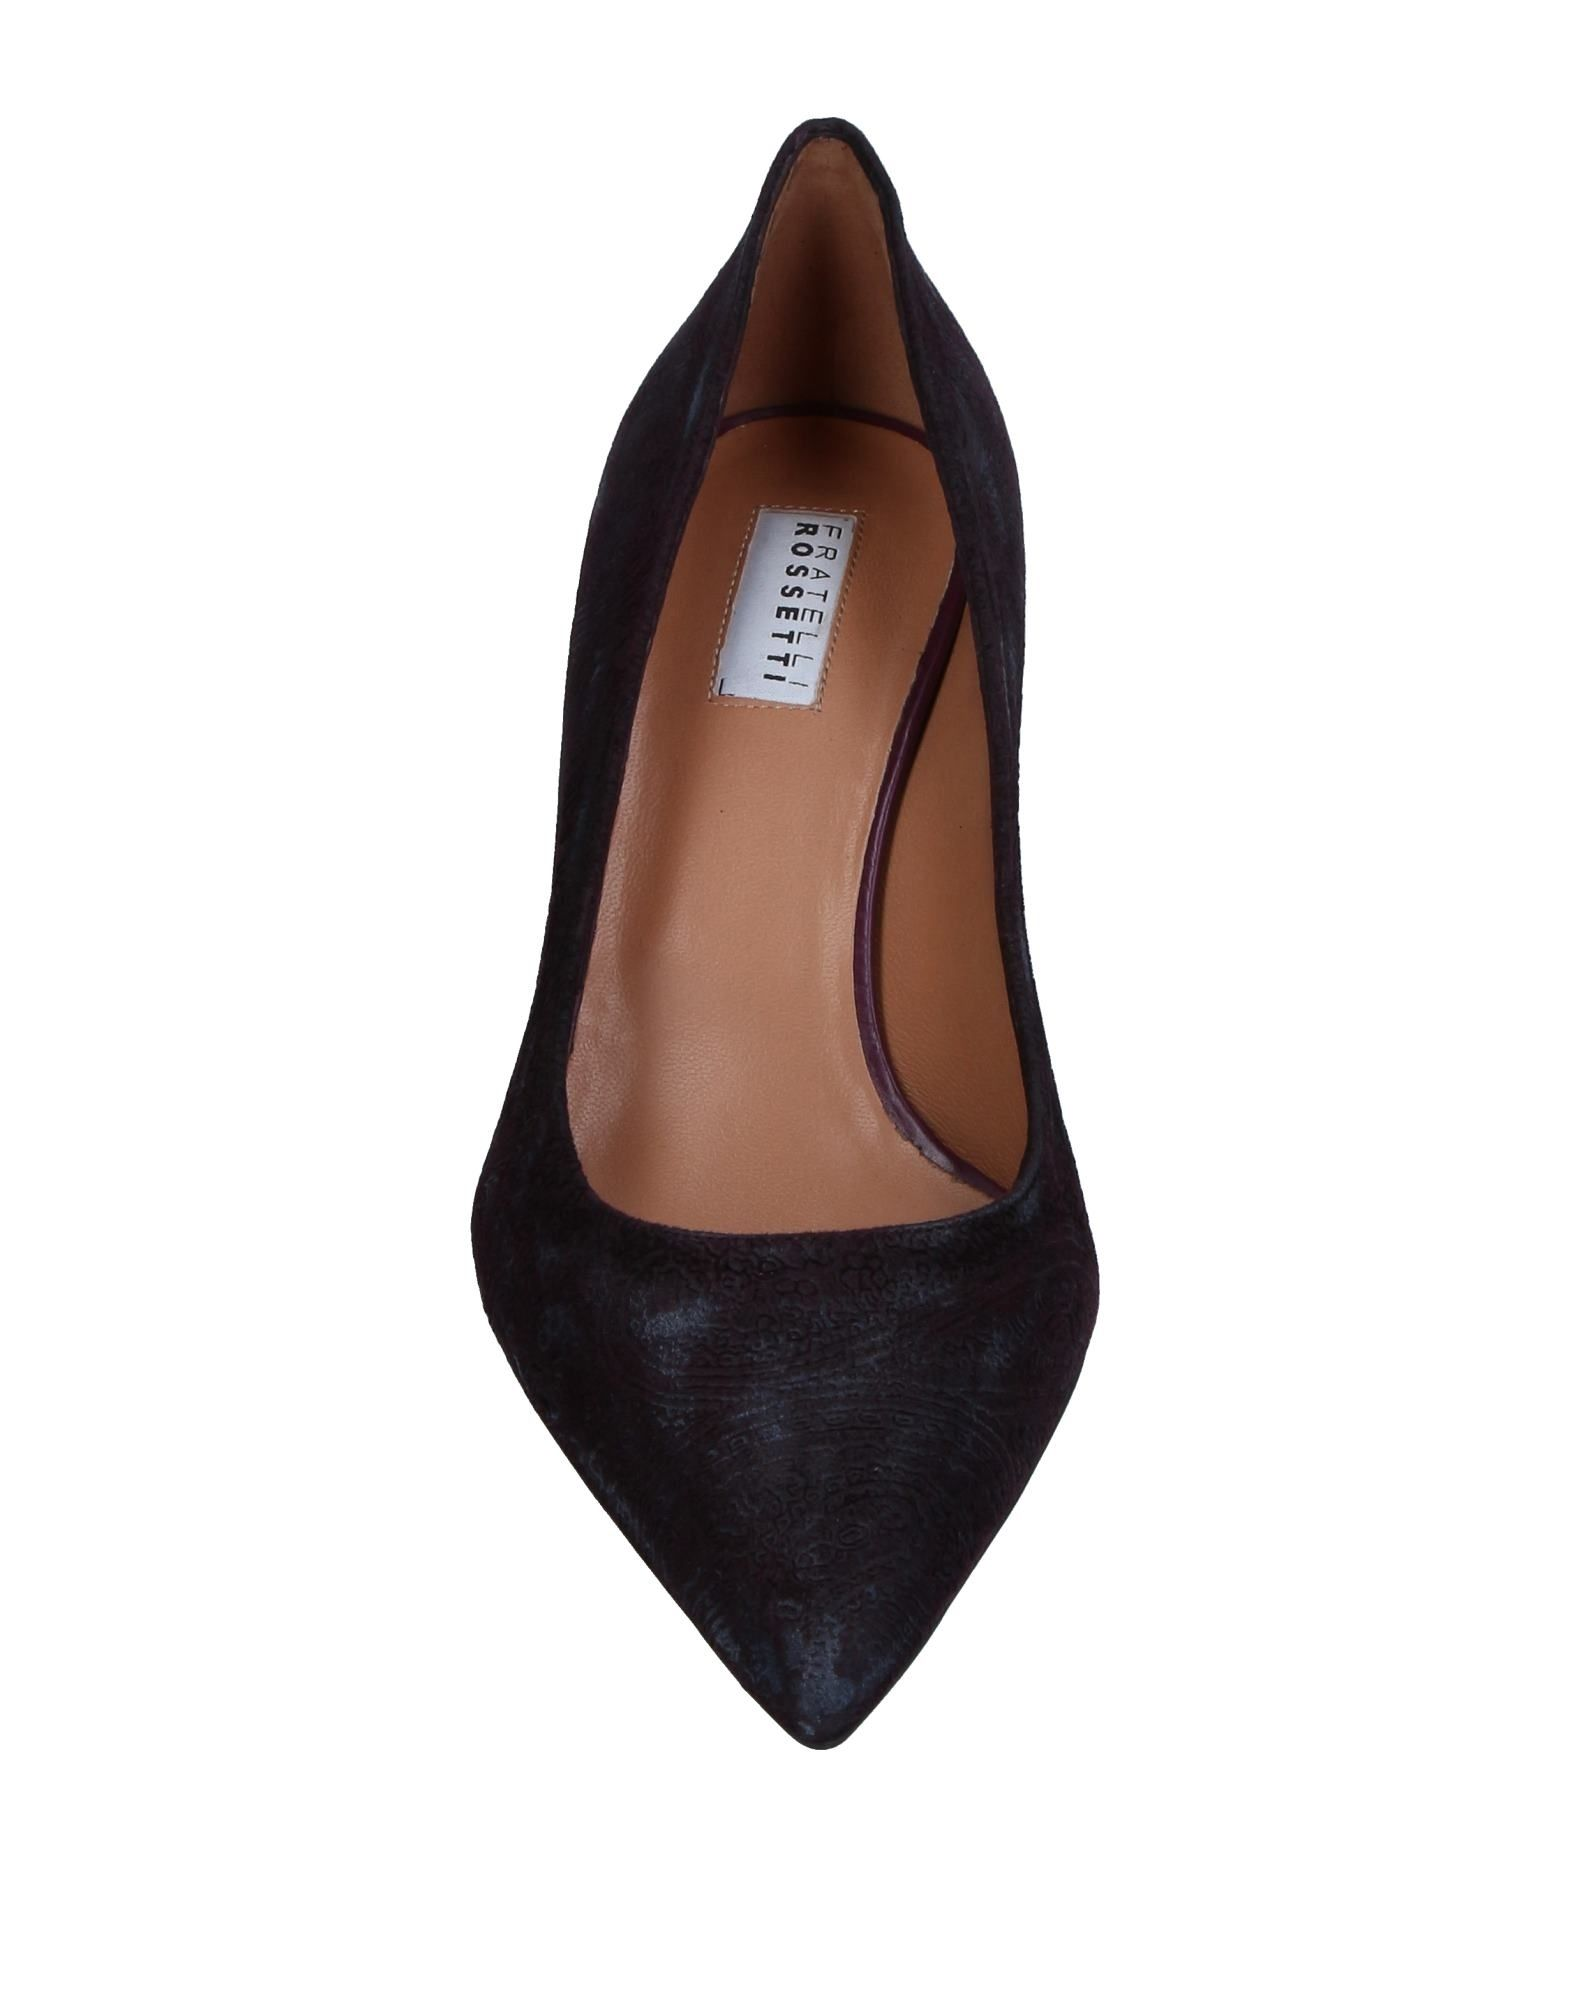 Stilvolle billige Schuhe Fratelli Rossetti Pumps Damen  11334217UK